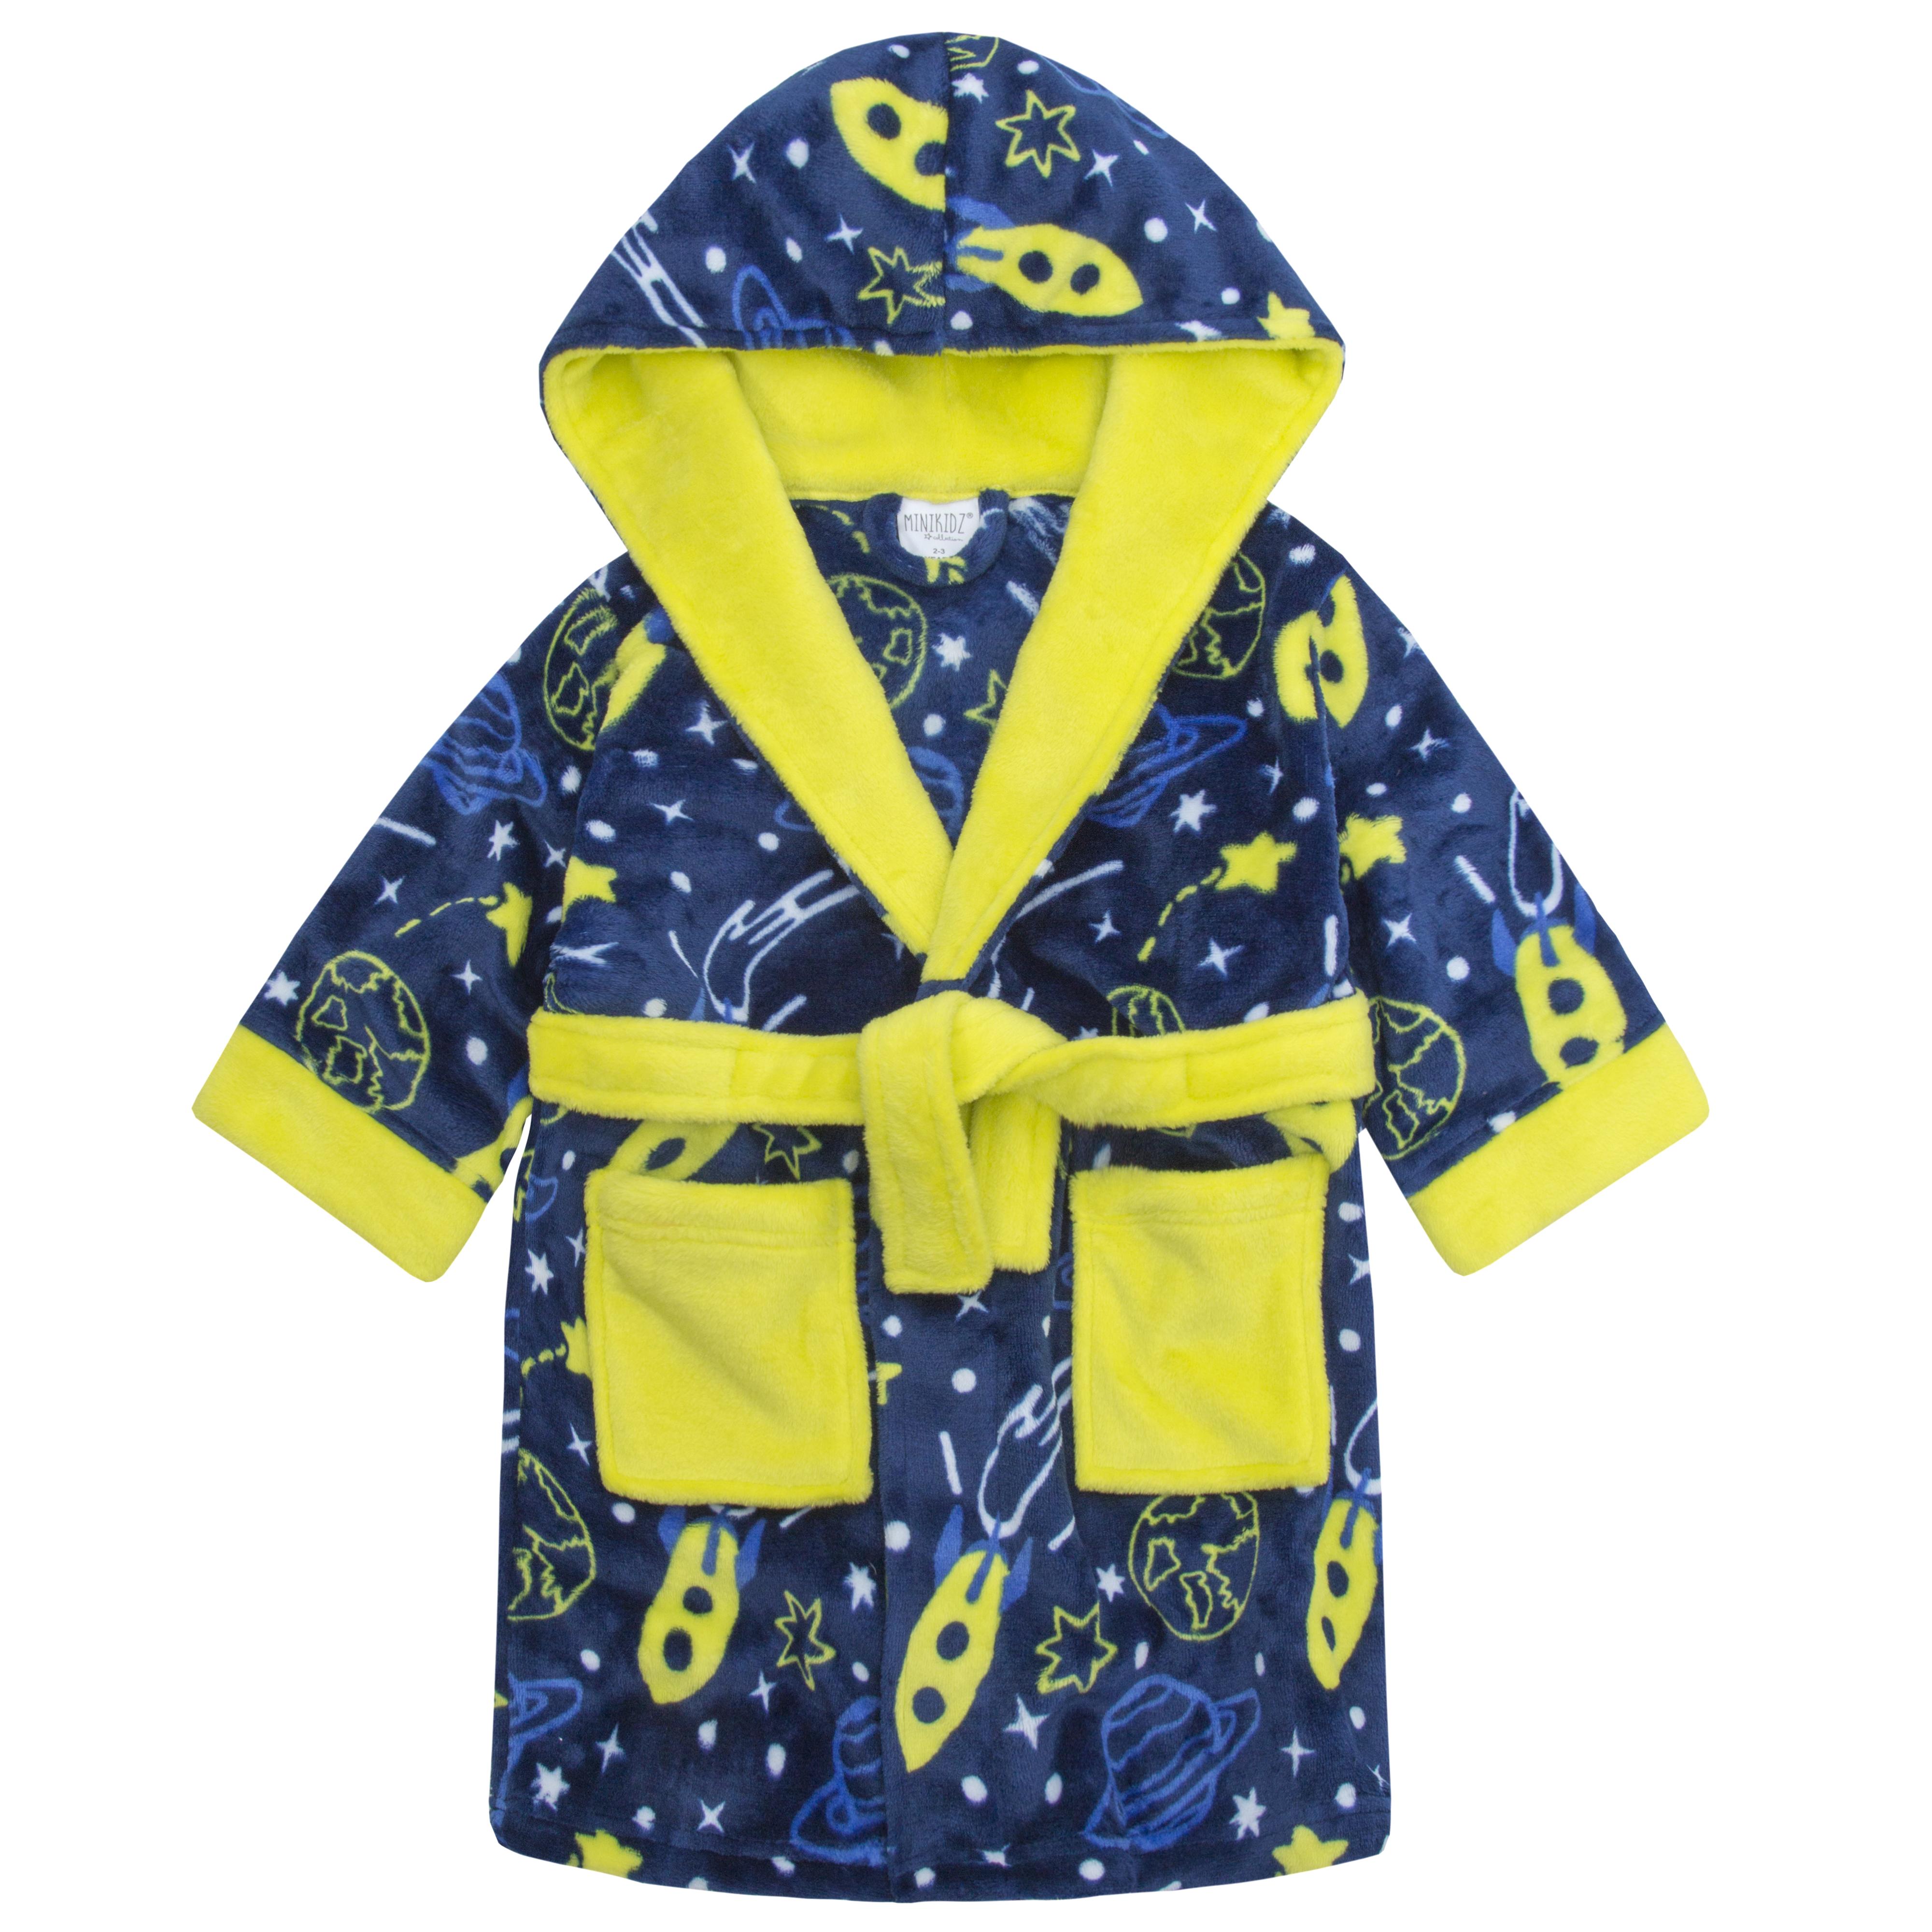 Boys Space Print Dressing Gown Robe Soft Plush Fleece Hooded Fluffy ...